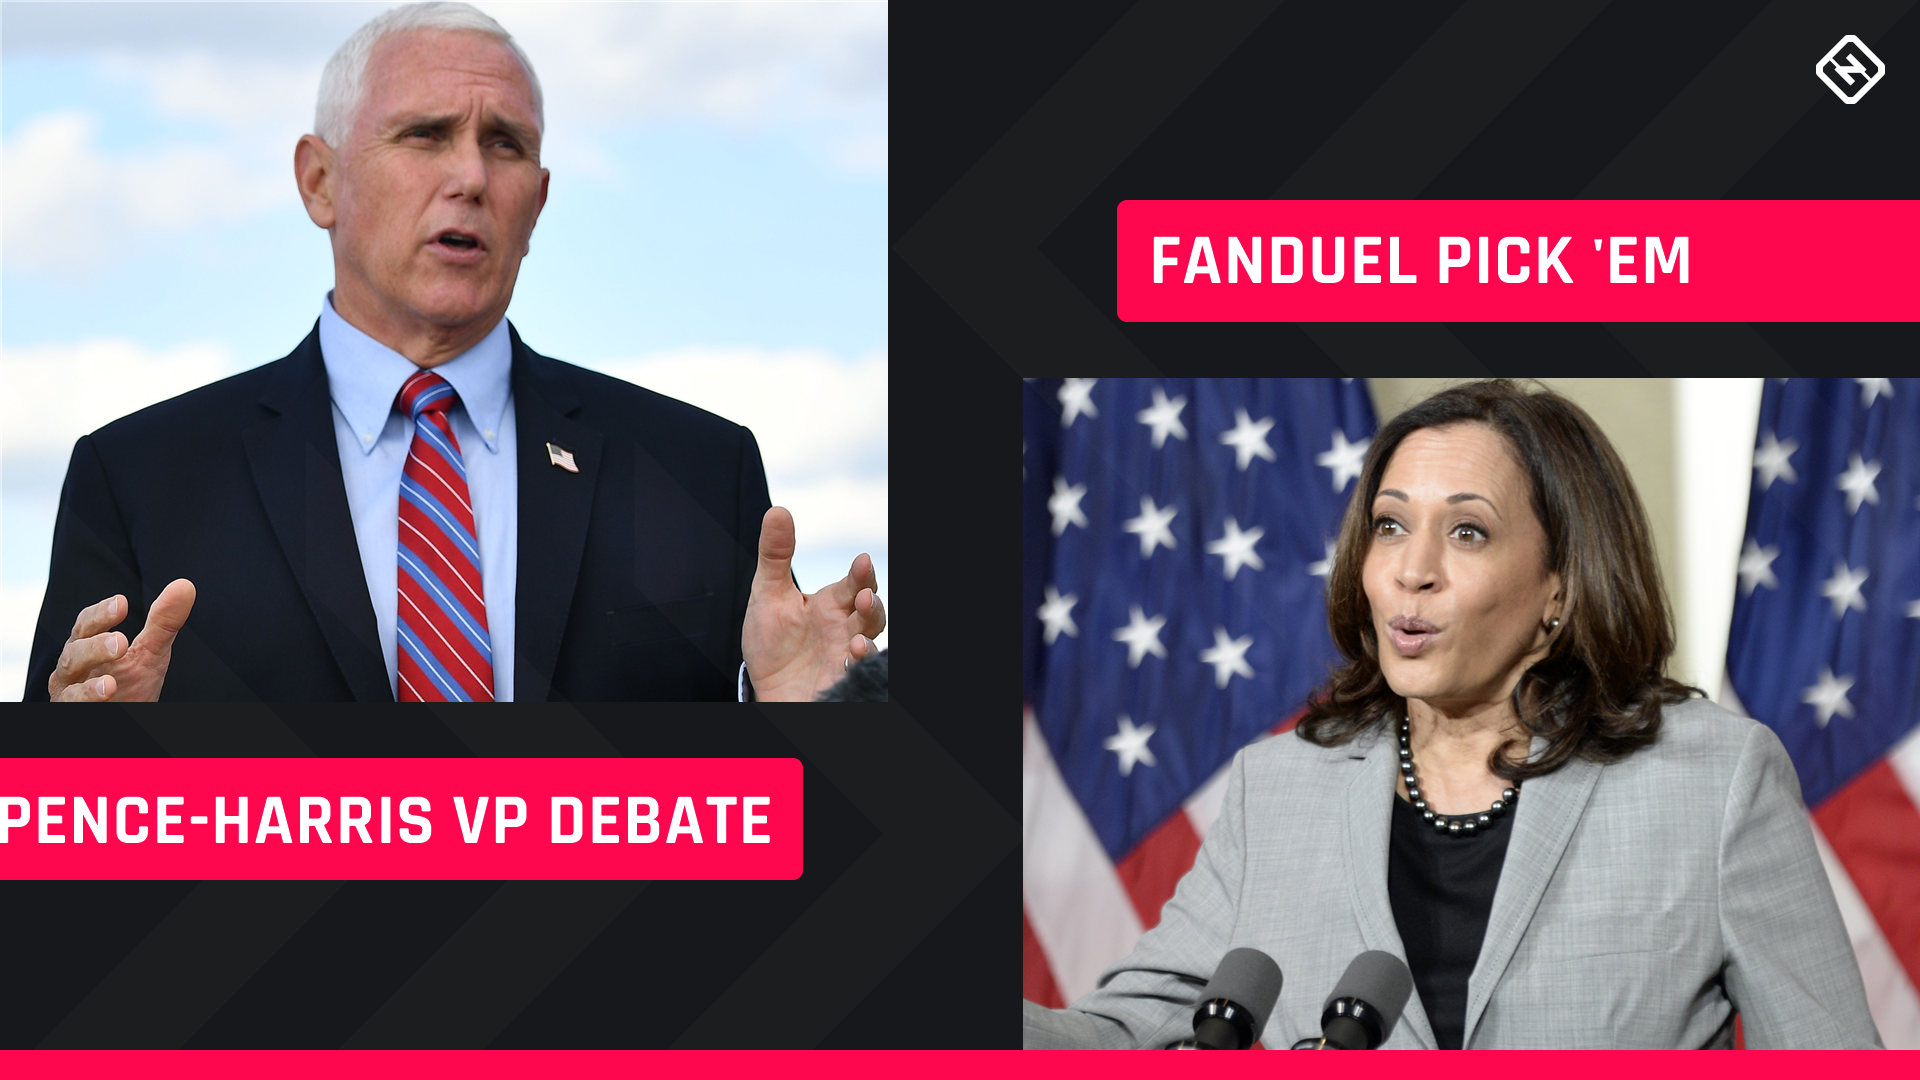 FanDuel Presidential Pick 'em: Prop bet-style picks for Pence-Harris vice presidential debate